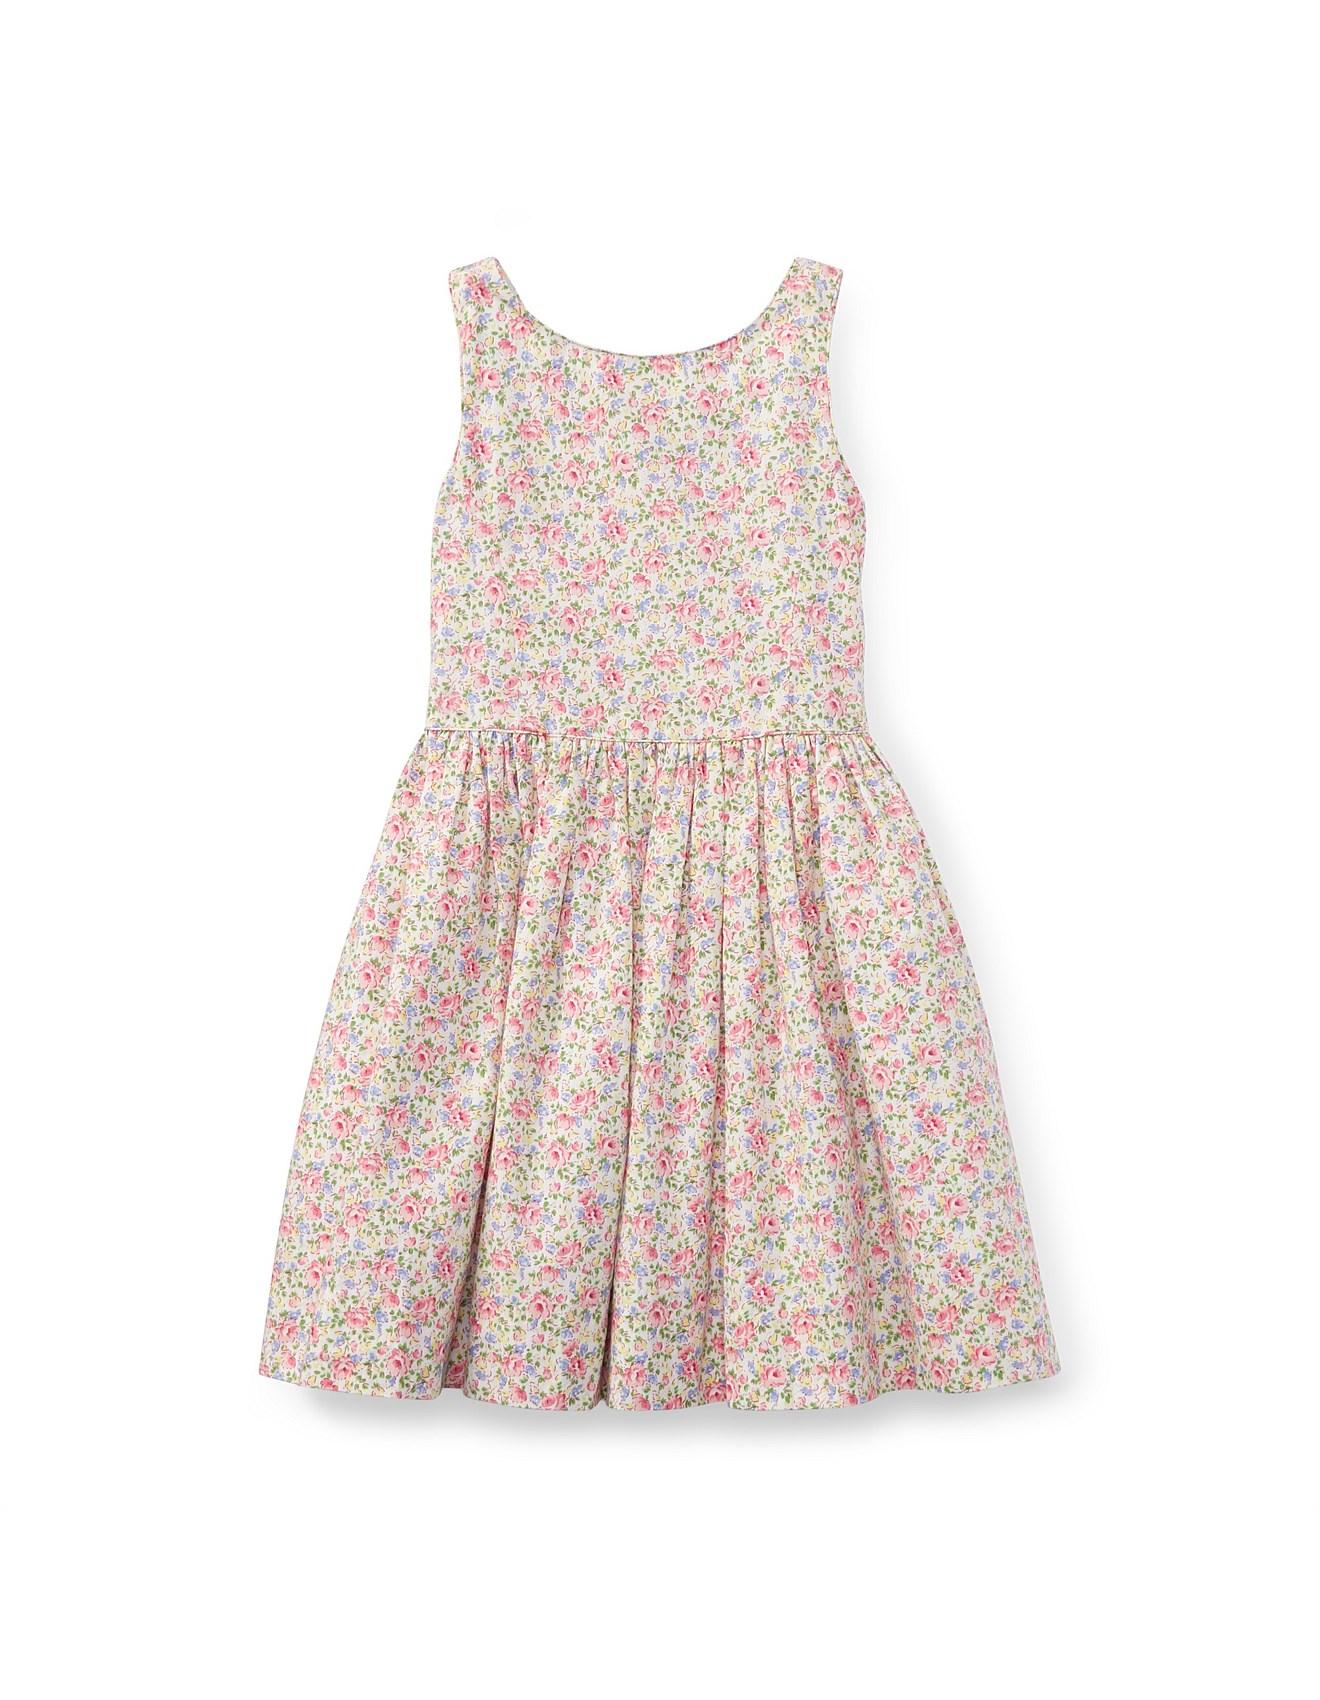 d220af8cb9d1 Kids - Floral Cotton Sleeveless Dress(2-7 Years)